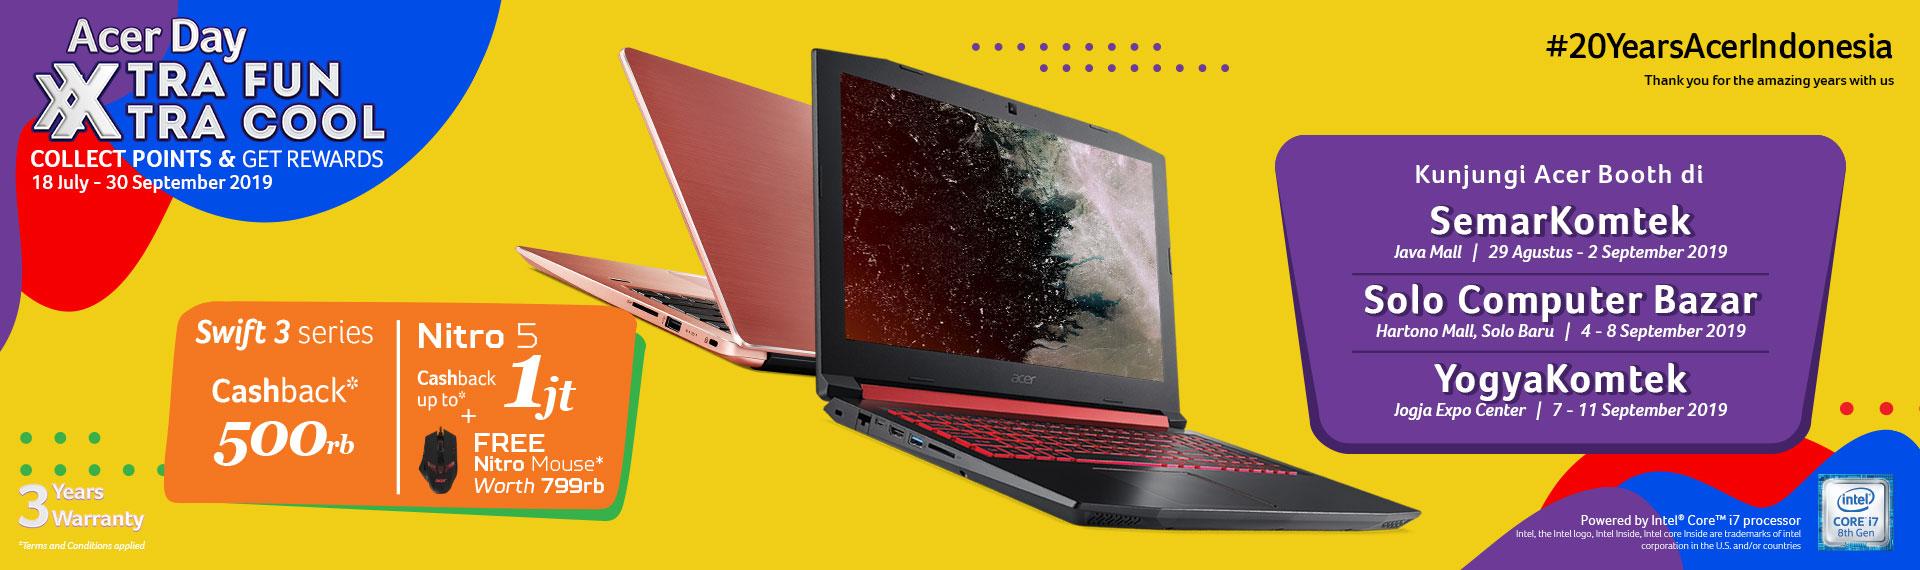 Dapatkan Langsung Promo Spesial Acer Day 2019 di Yogyakomtek, Semarkomtek, serta Solo Computer Bazar!